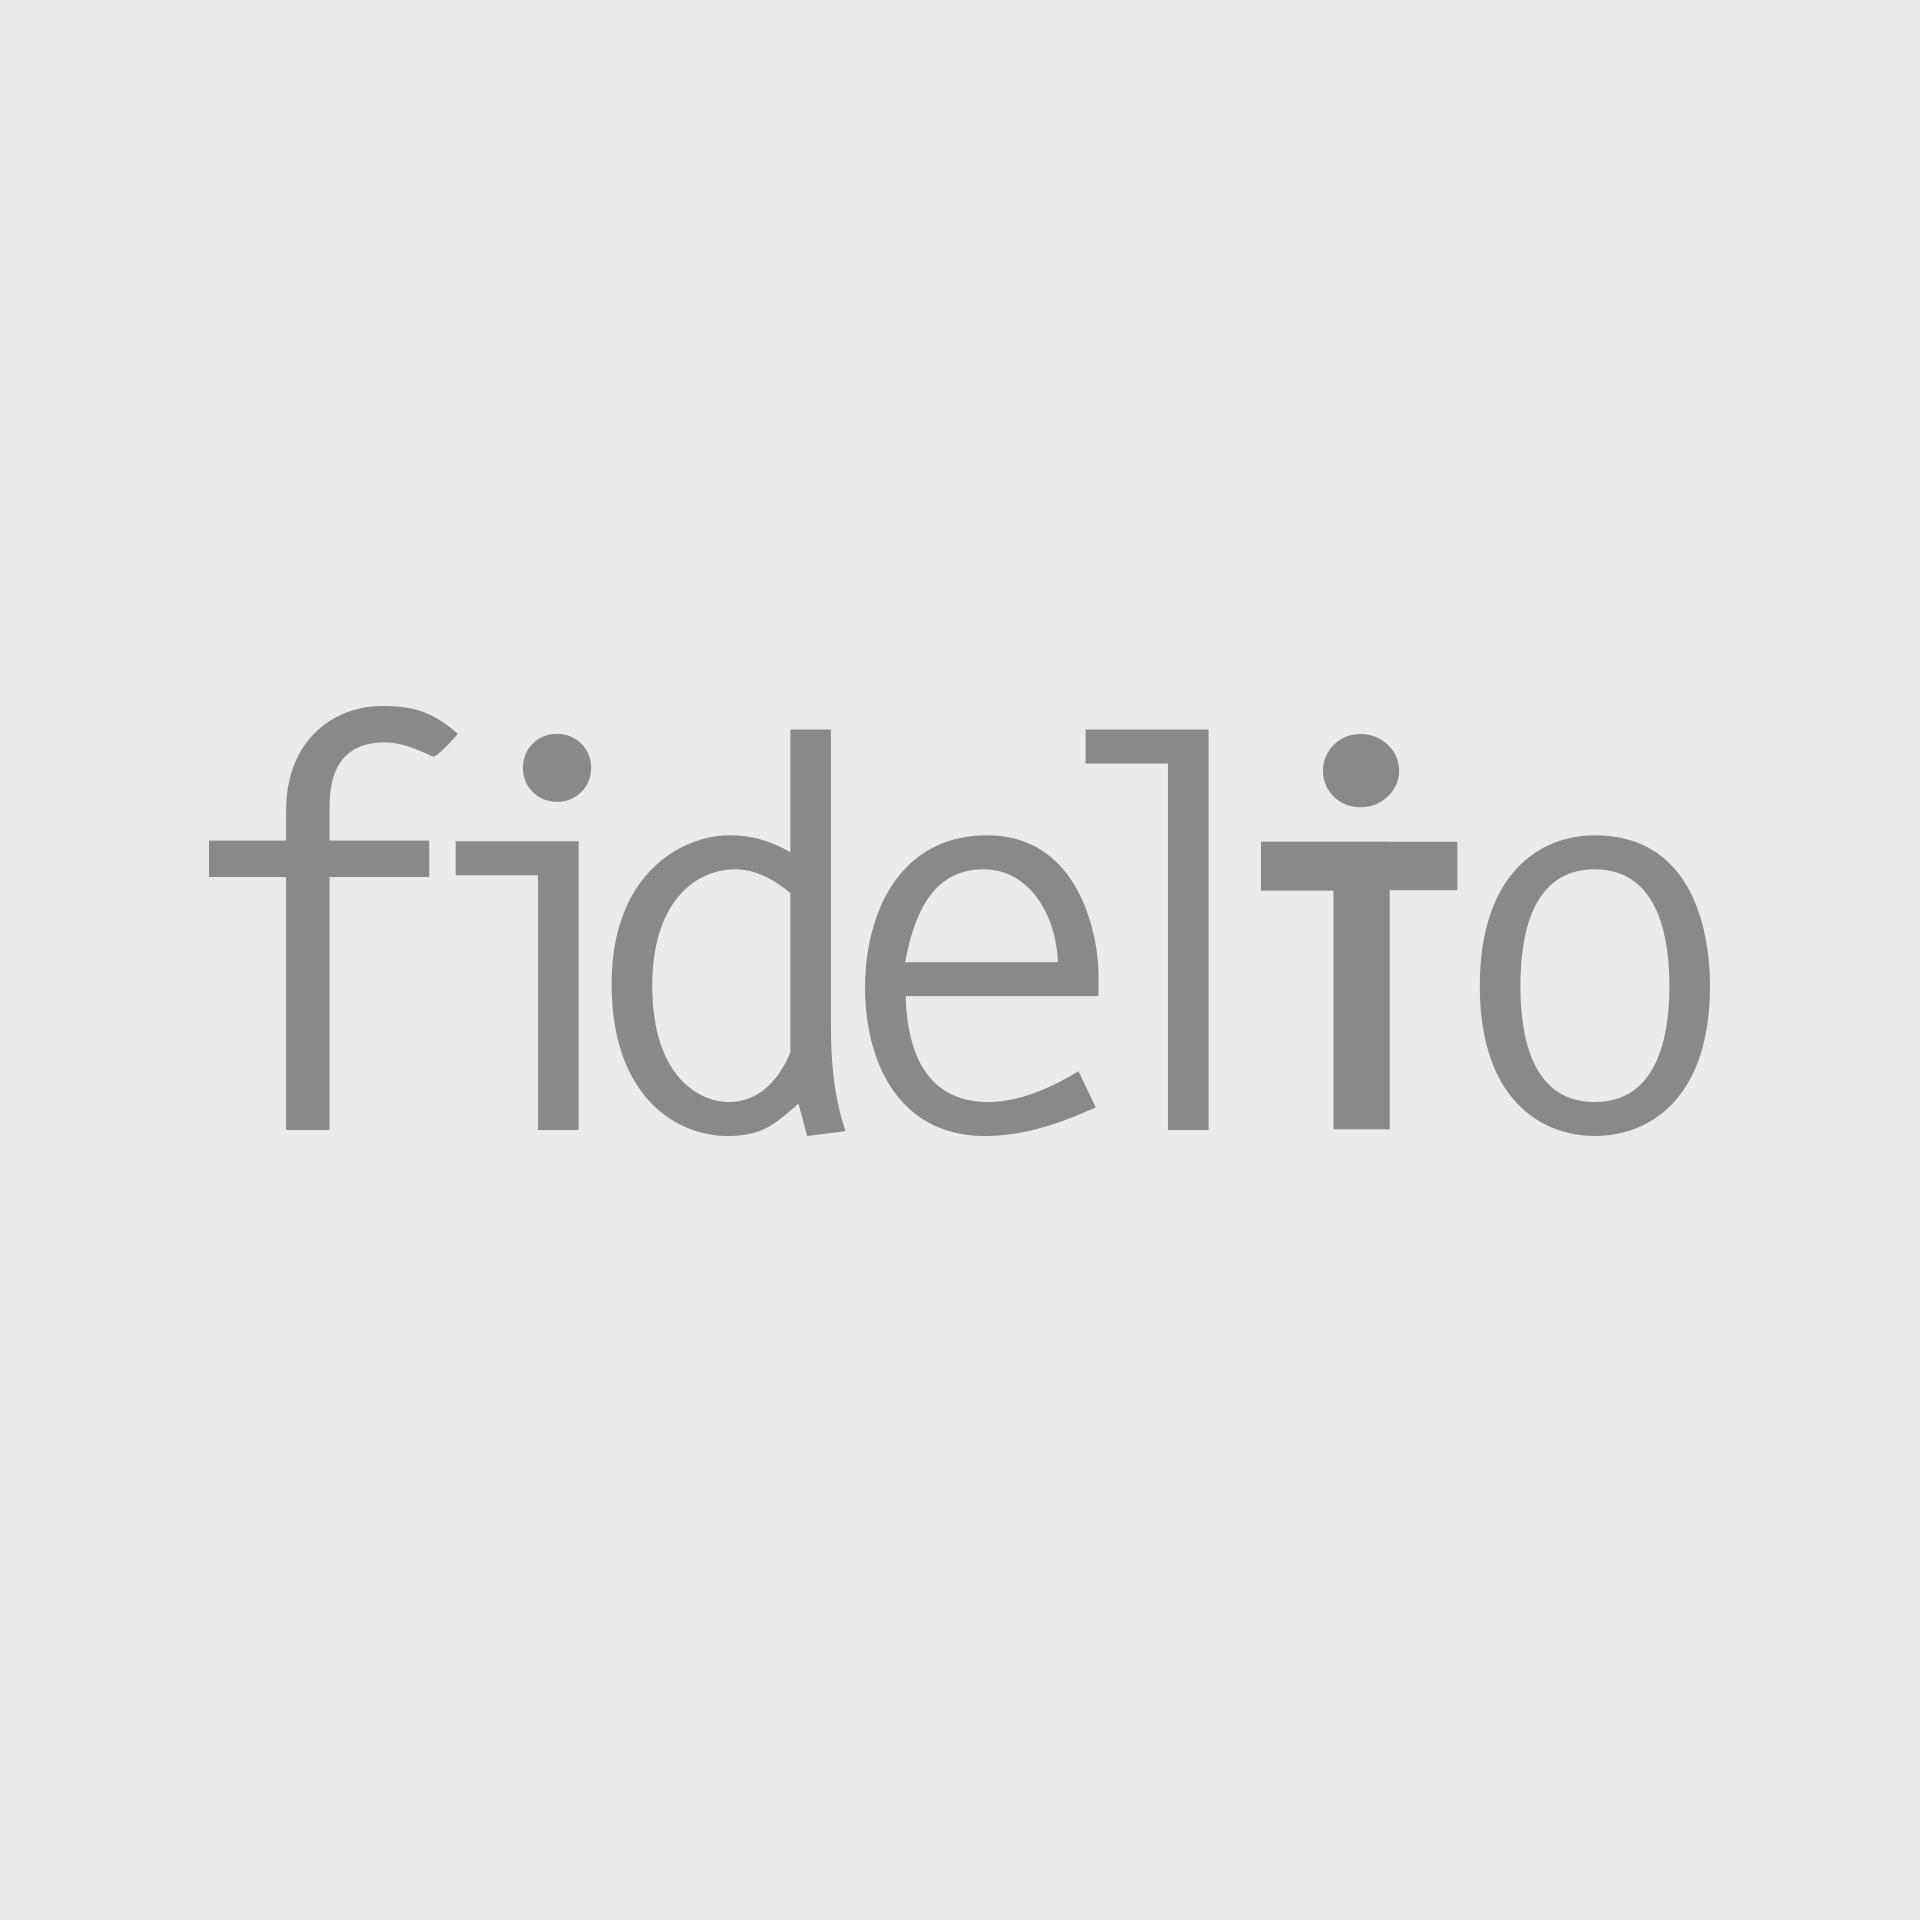 Fidelio Napi Zene – Weiner Leó: Rókatánc